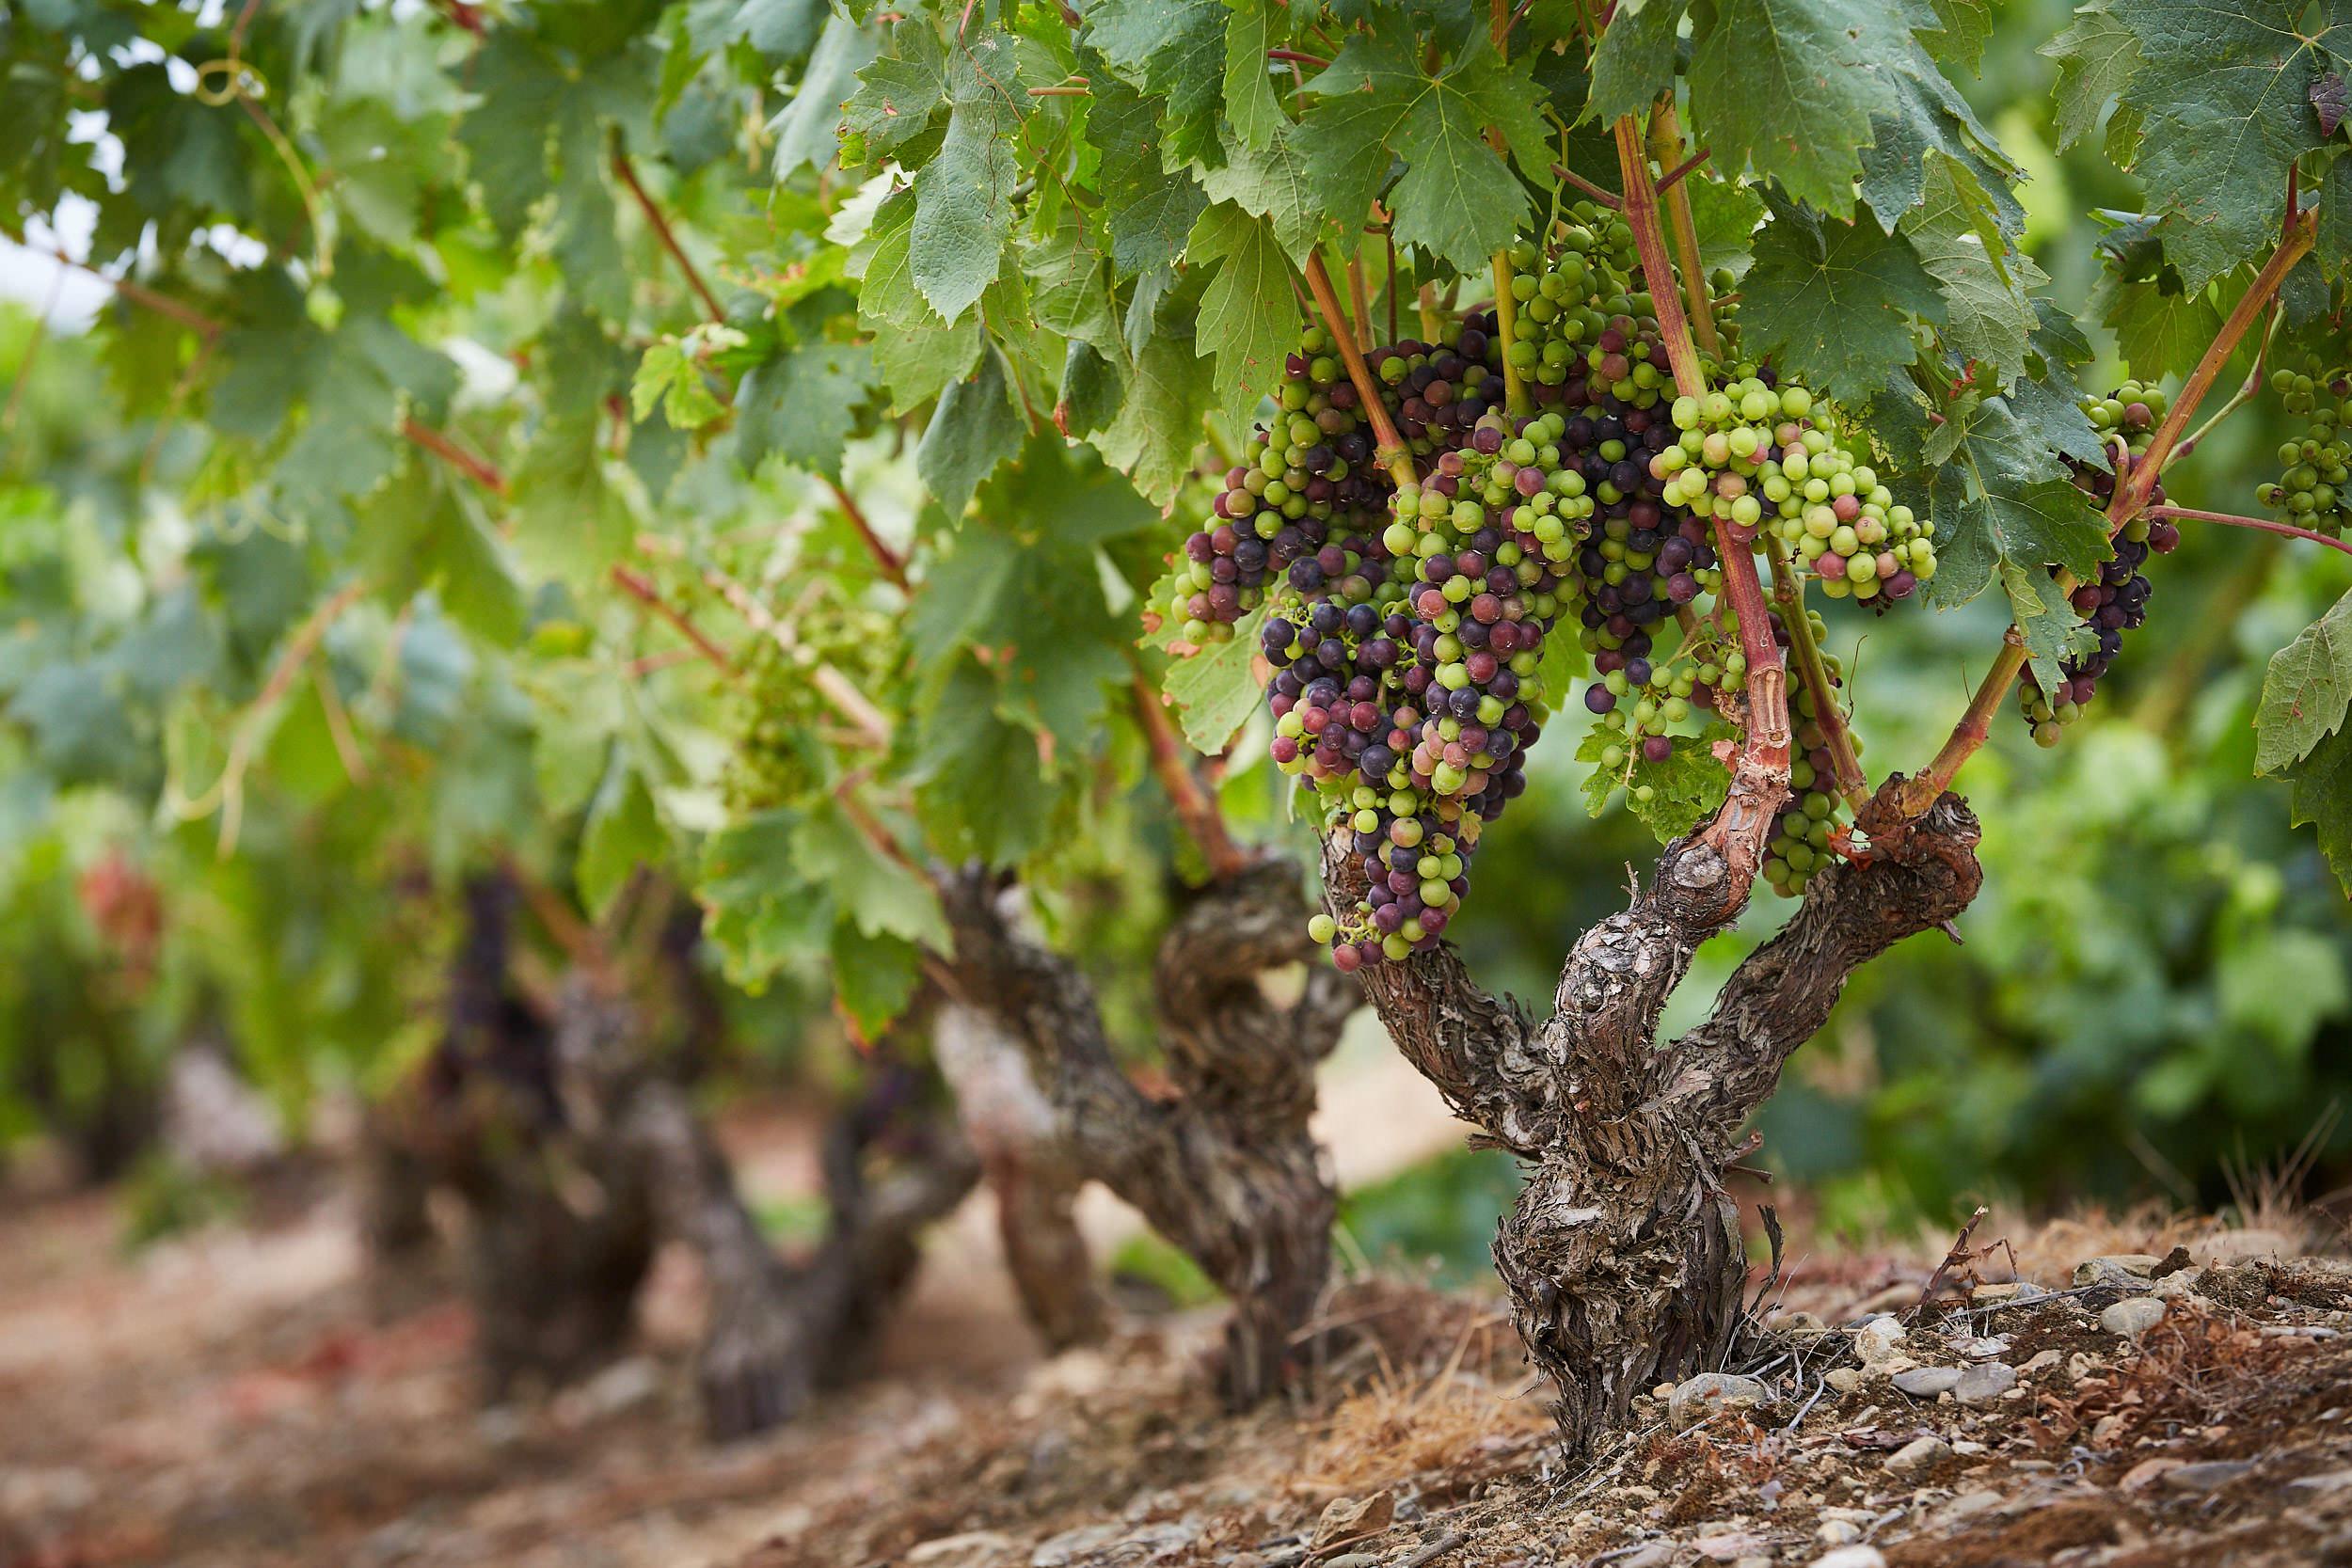 1808Commercial-professional-wine-photography-la-rioja-spain-James-Sturcke_0035.jpg